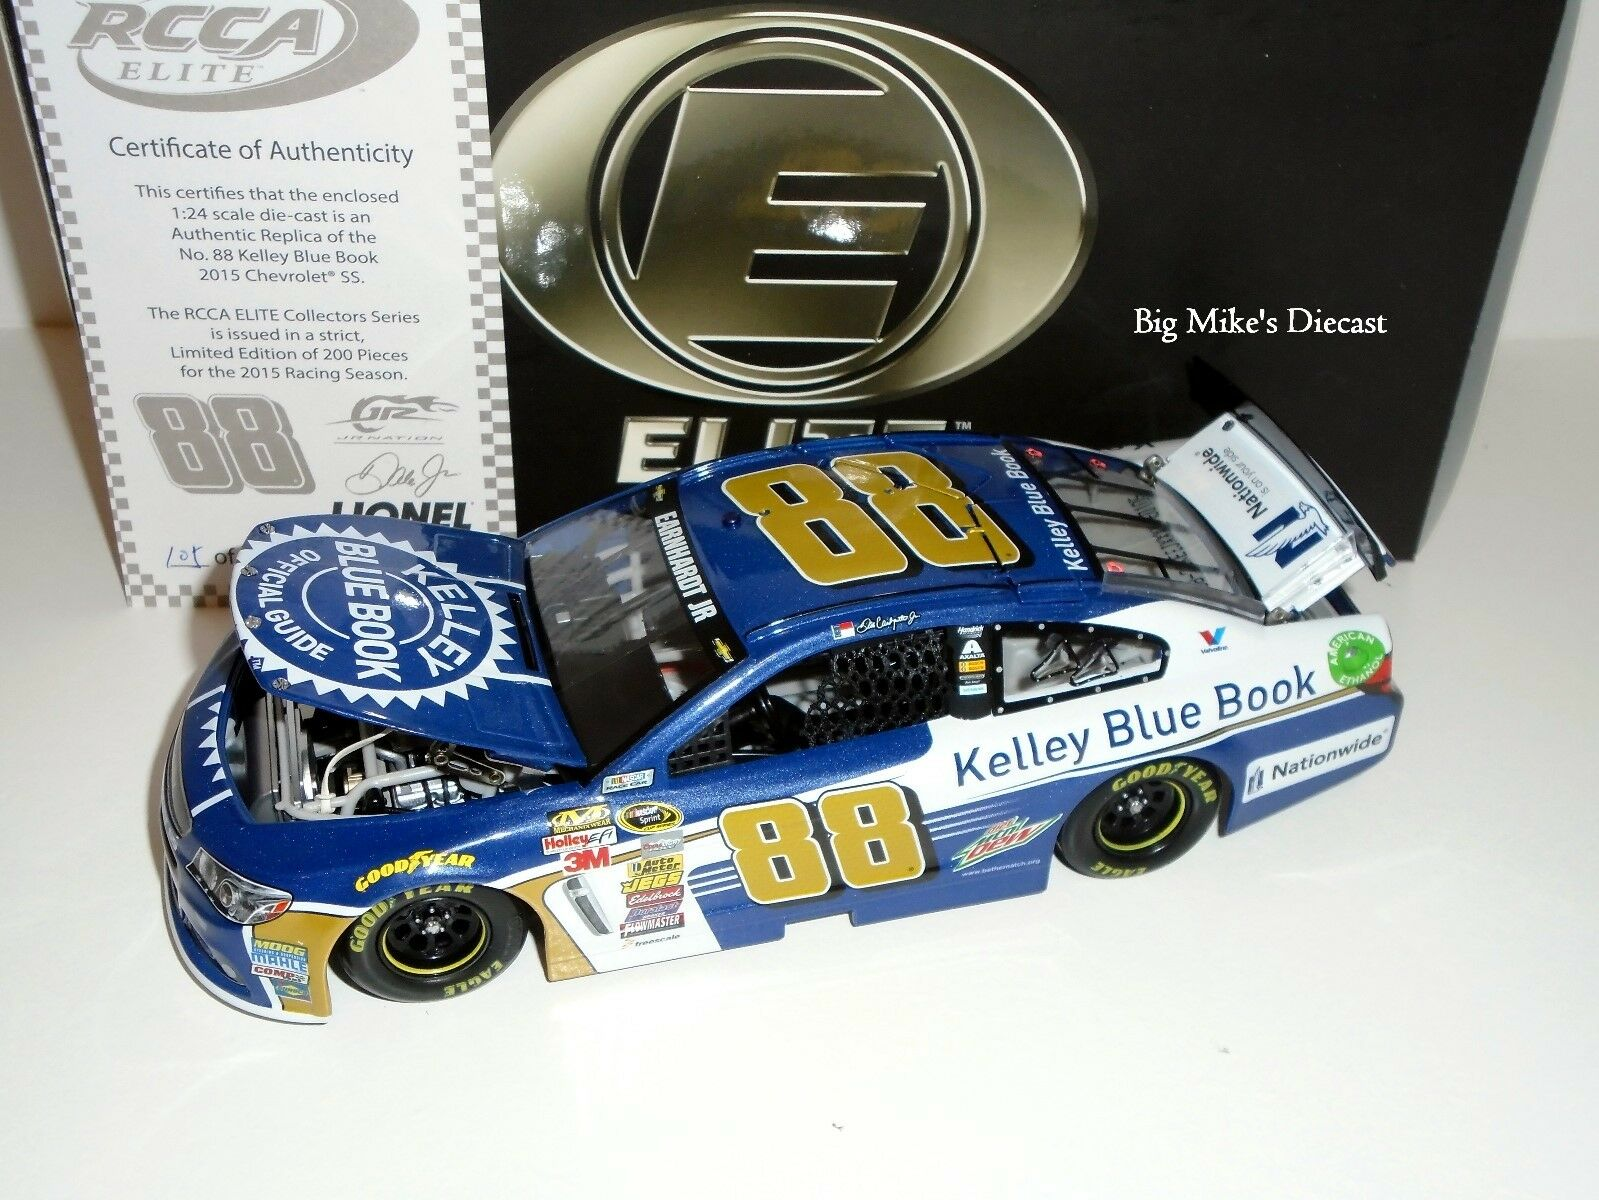 2015 Dale Earnhardt Jr. Kelley bluee Book 1 24 Diecast Elite